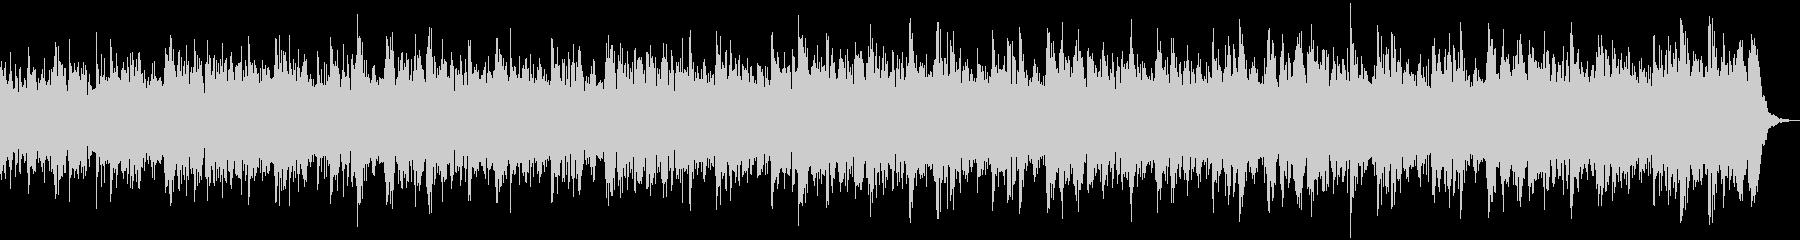 【CM】クールなエレクトロBGM・10の未再生の波形